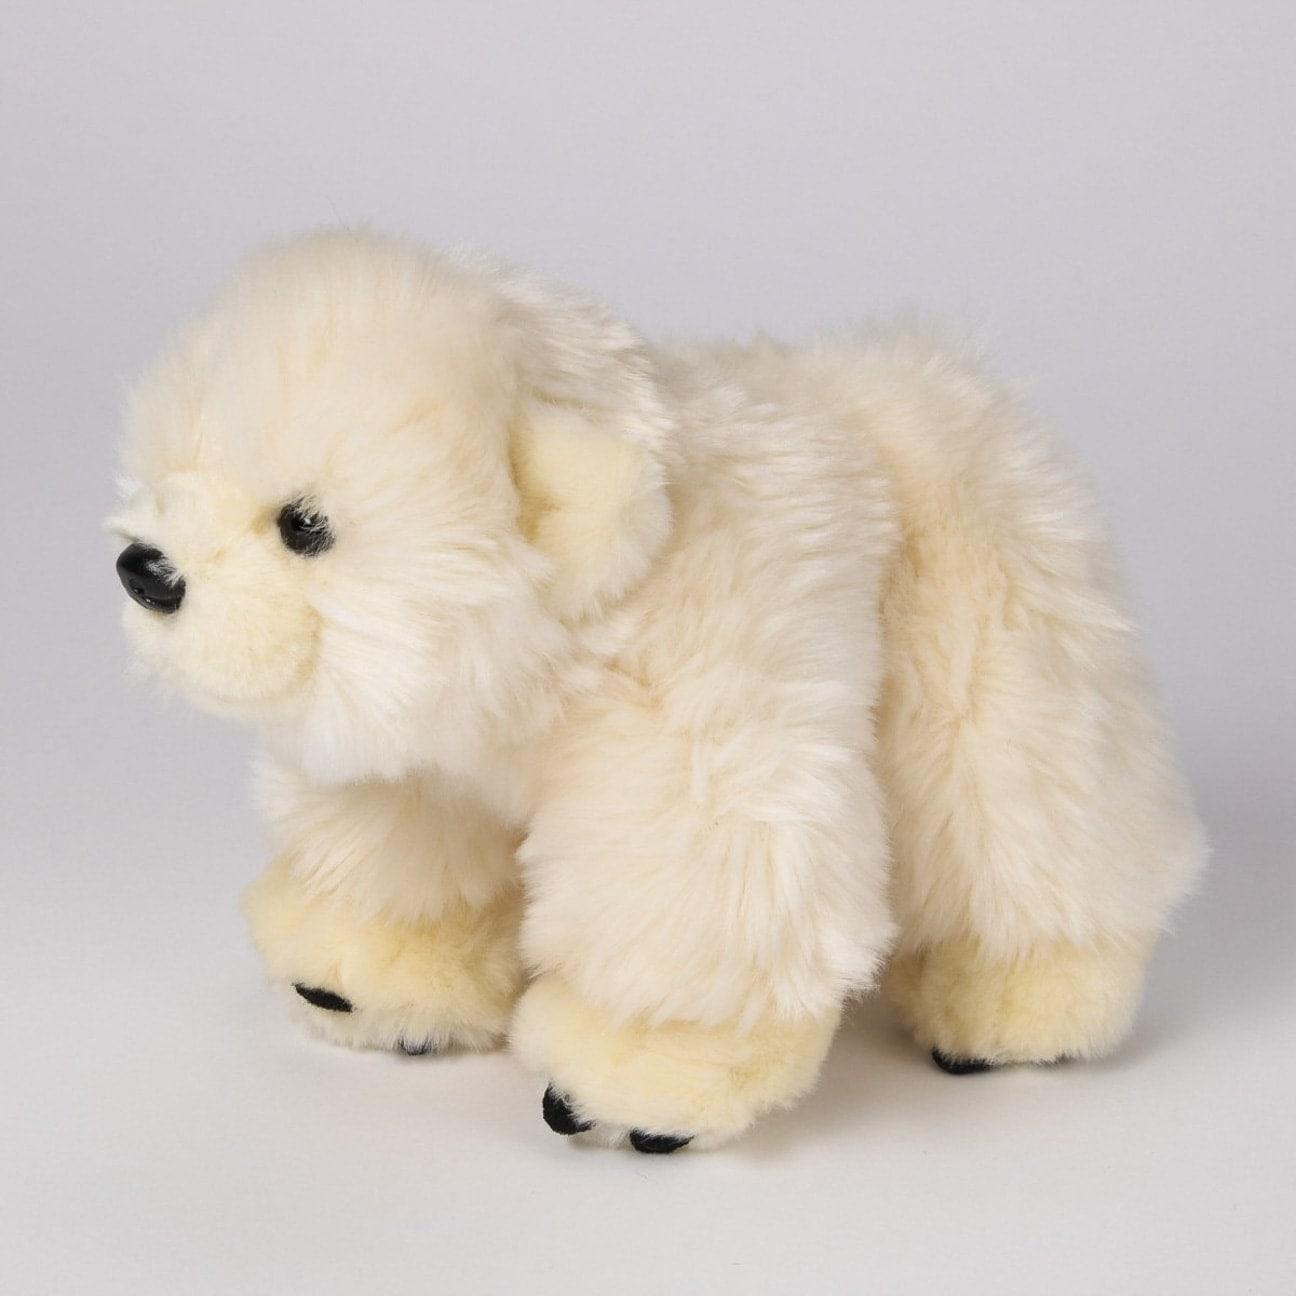 Peluche Oso Polar Baby 20 cm by Eisb